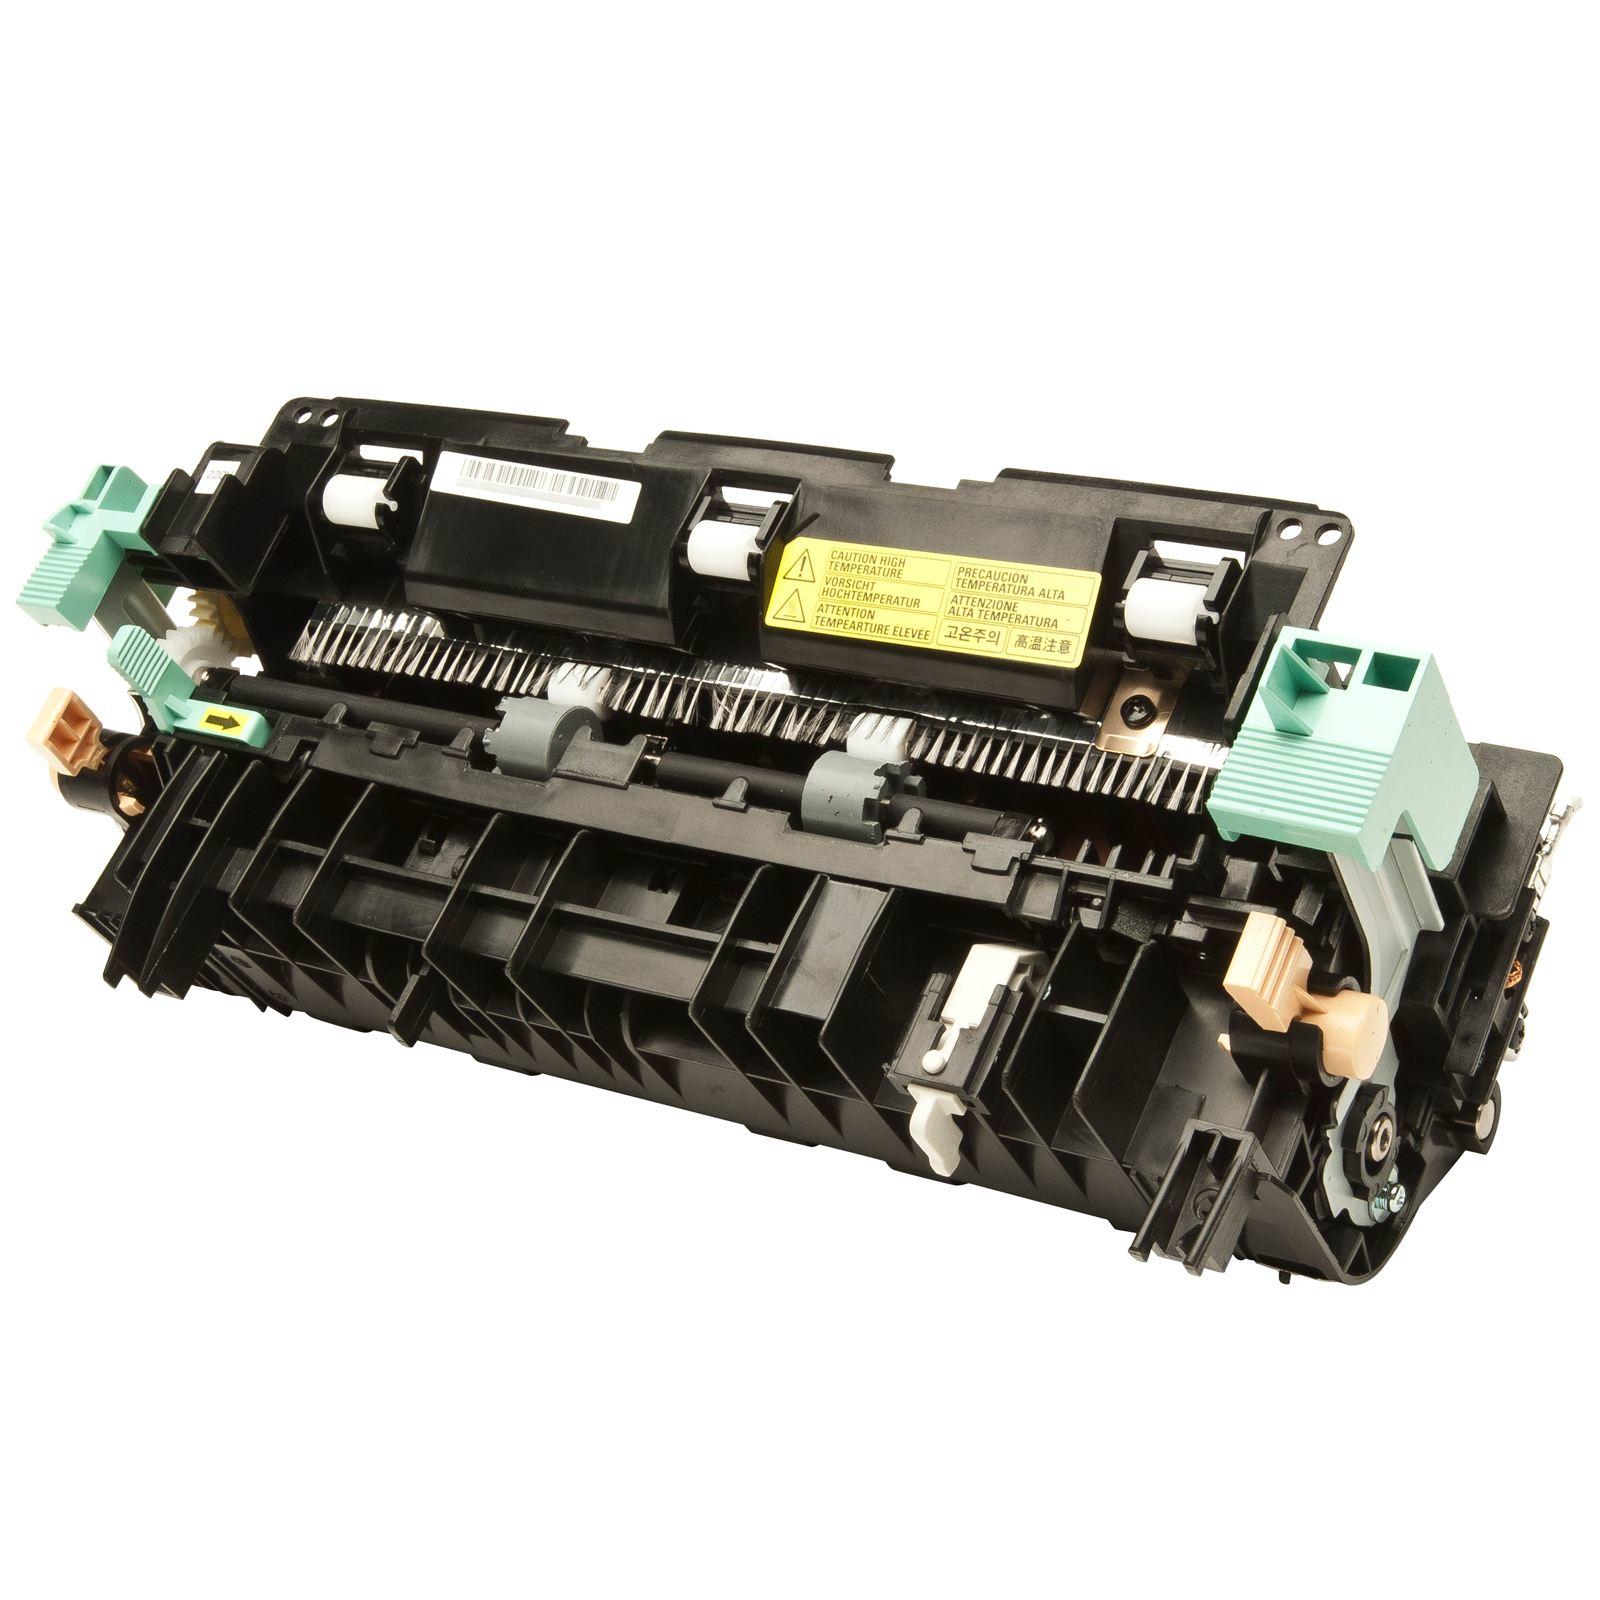 Samsung JC96-04413B Fuser kit